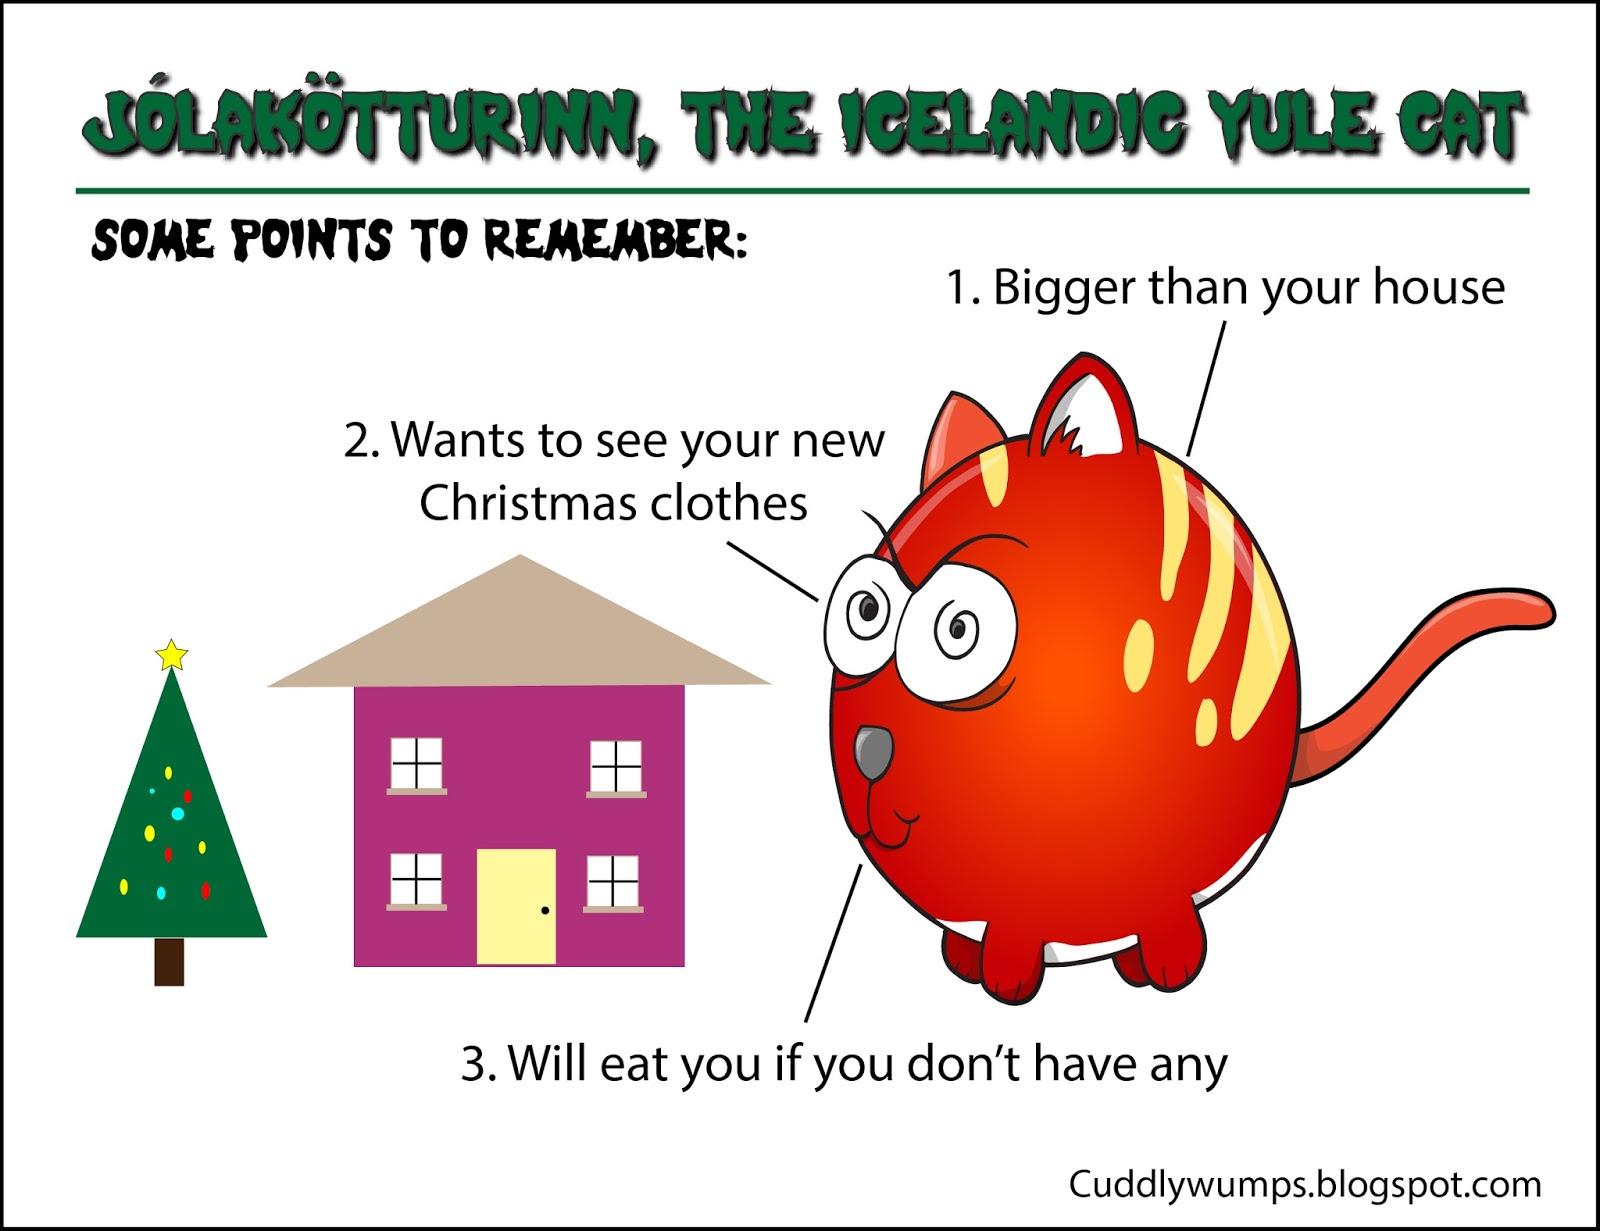 jlaktturinn the icelandic yule cat some points to remember jlaktturinn yulecat - Merry Christmas In Icelandic